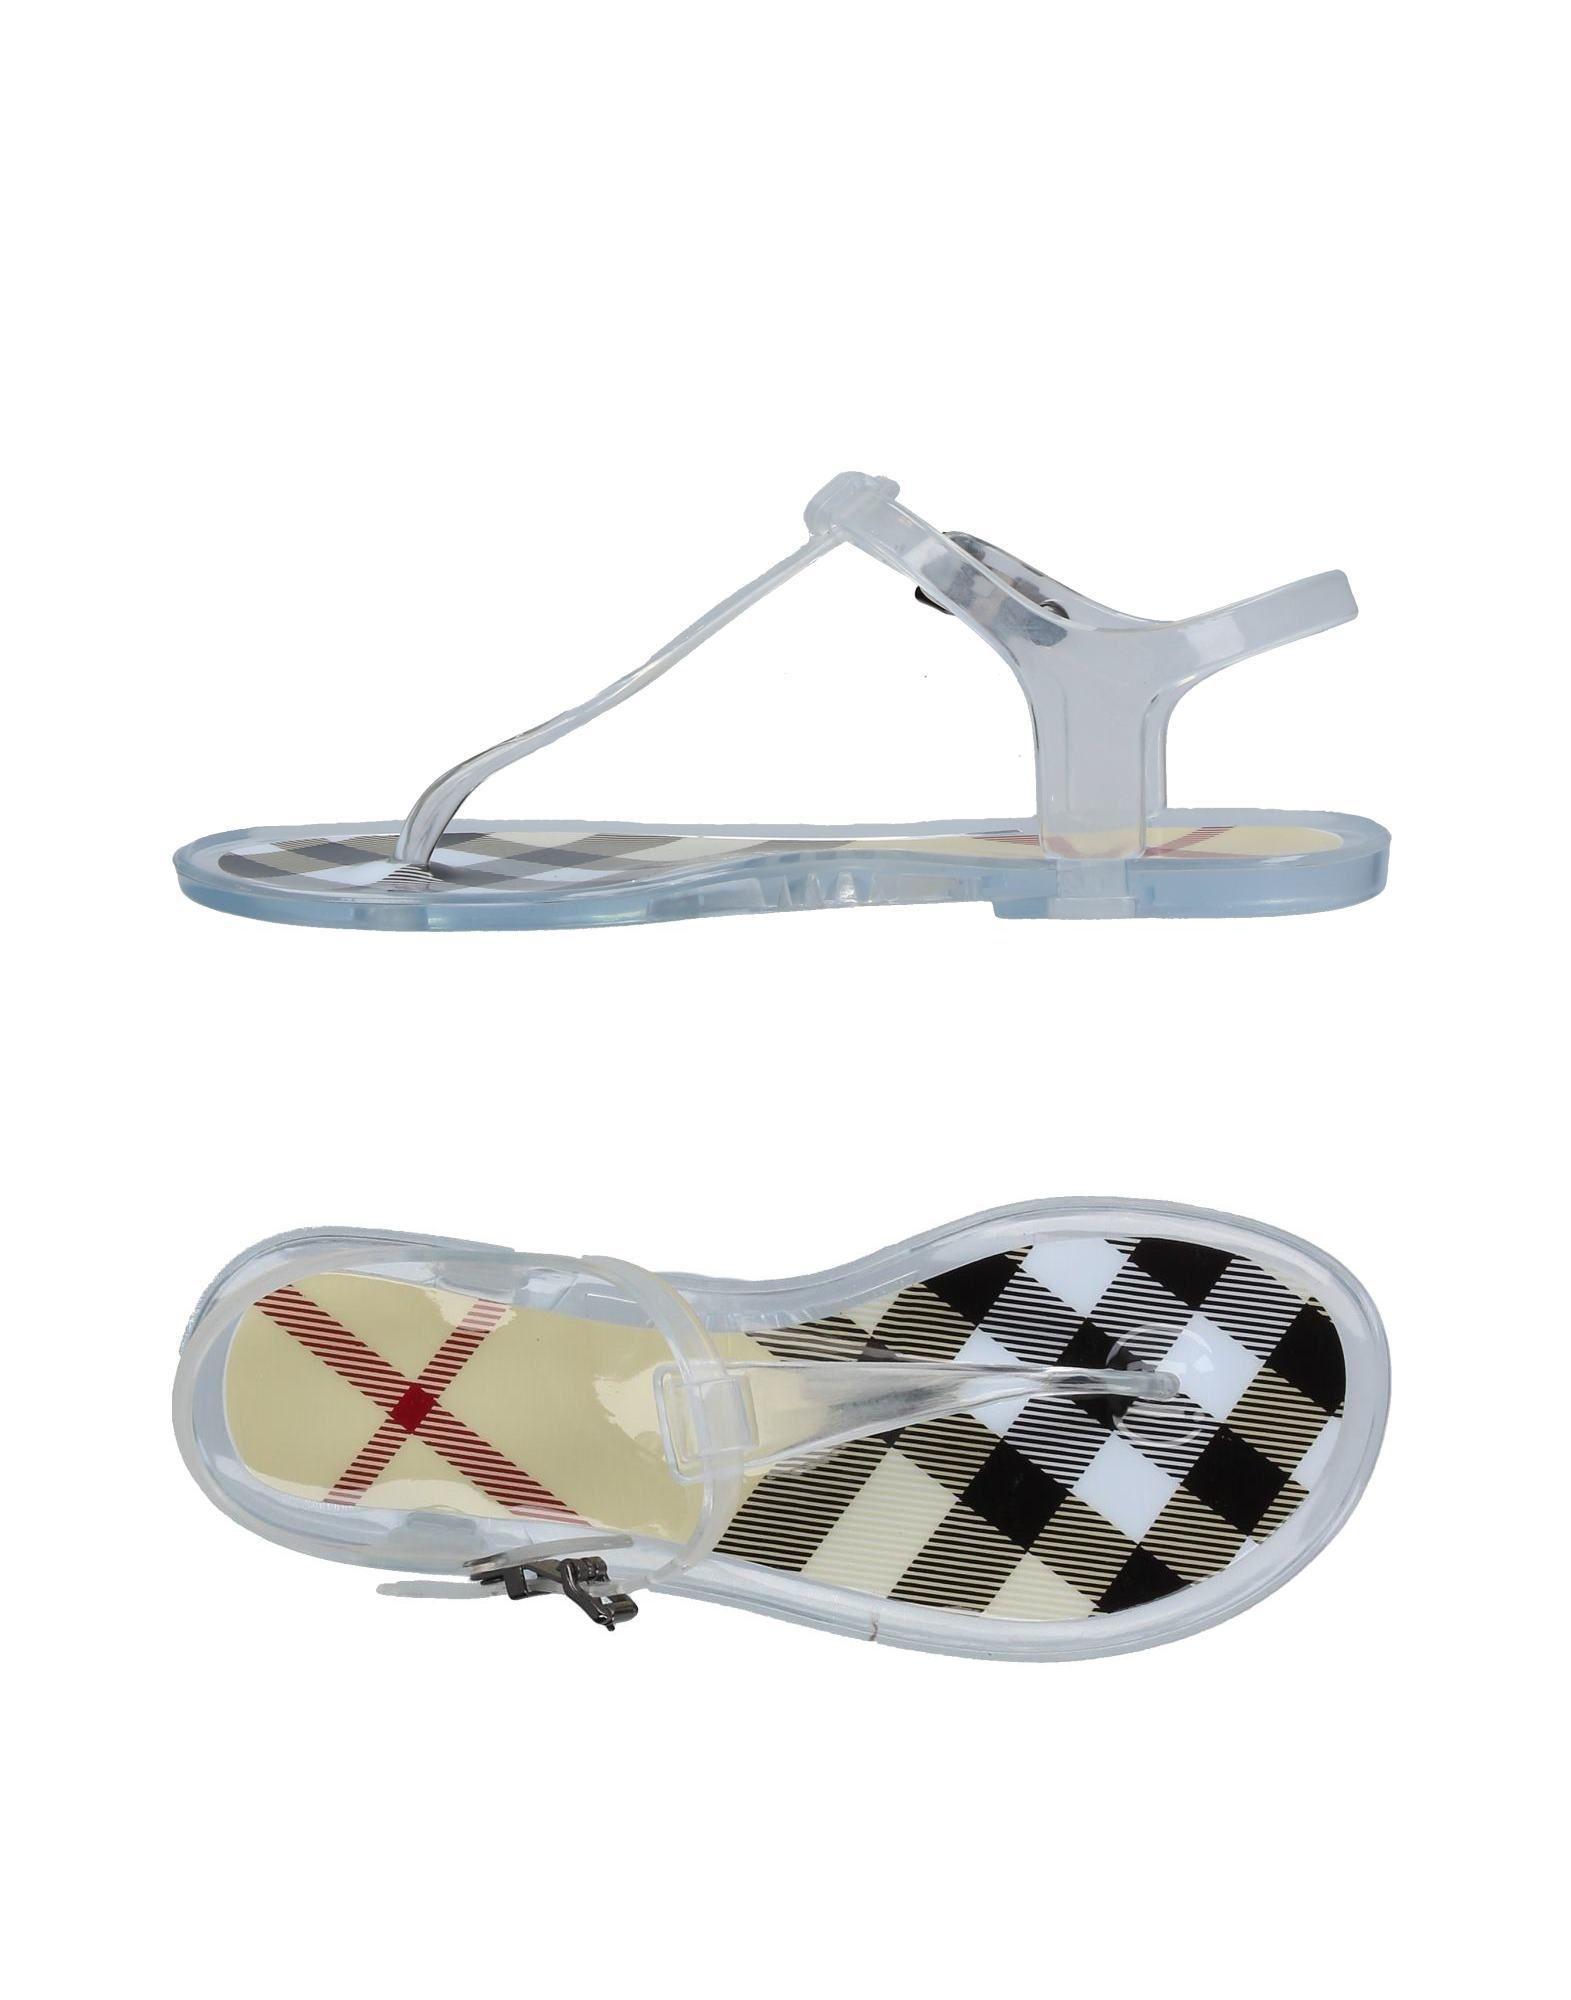 d85276ad1d09 Lyst - Burberry Toe Strap Sandal